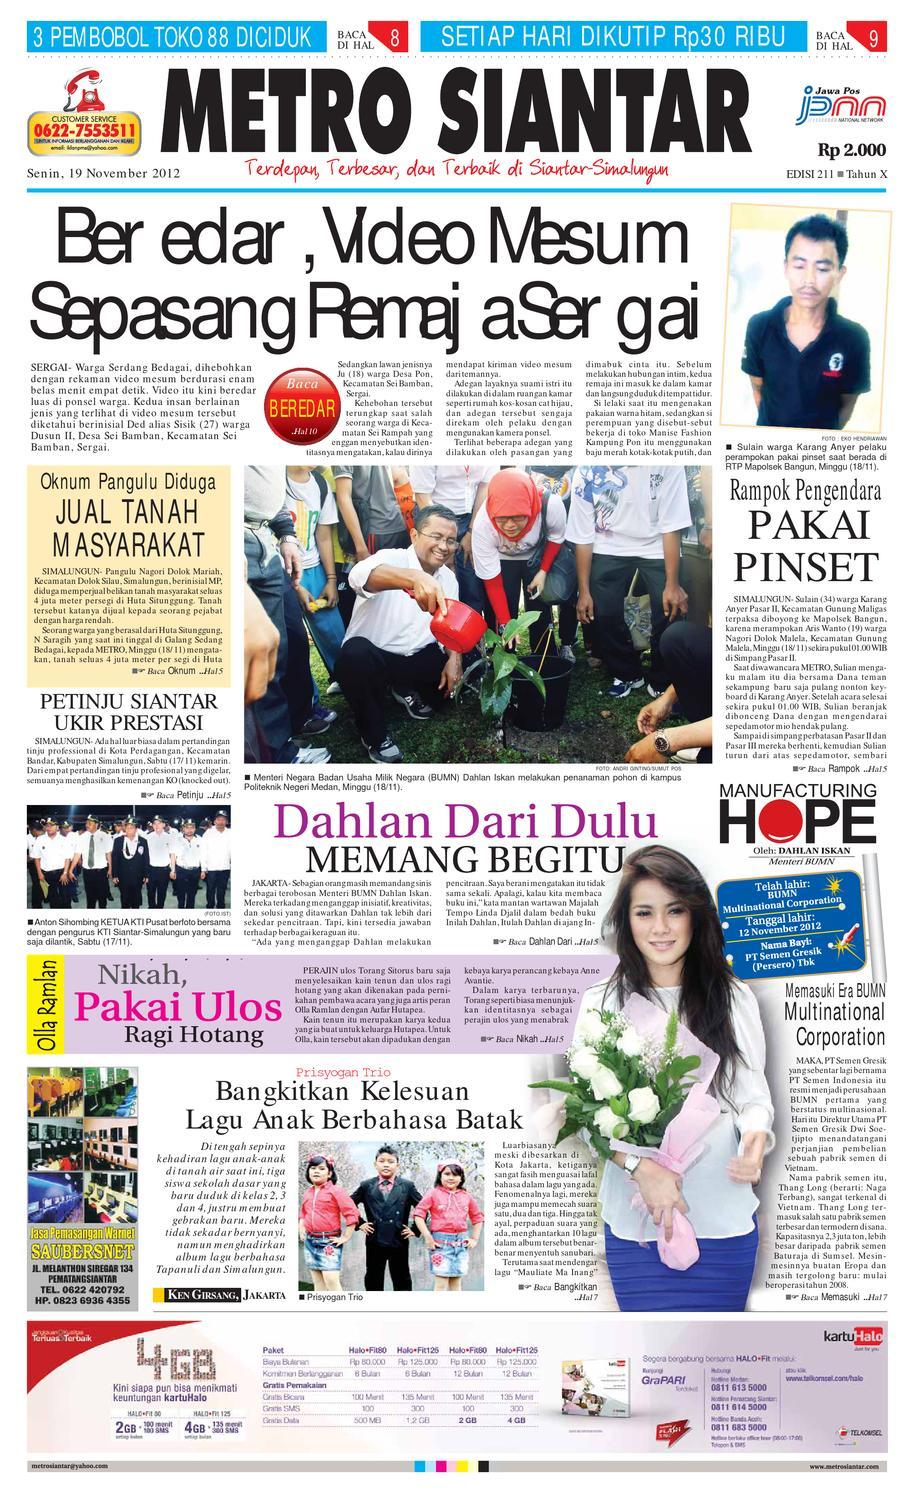 Epaper Metro Siantar By Issuu Produk Ukm Bumn Atasan Tenun Pria Lengan Pendek Hijau B